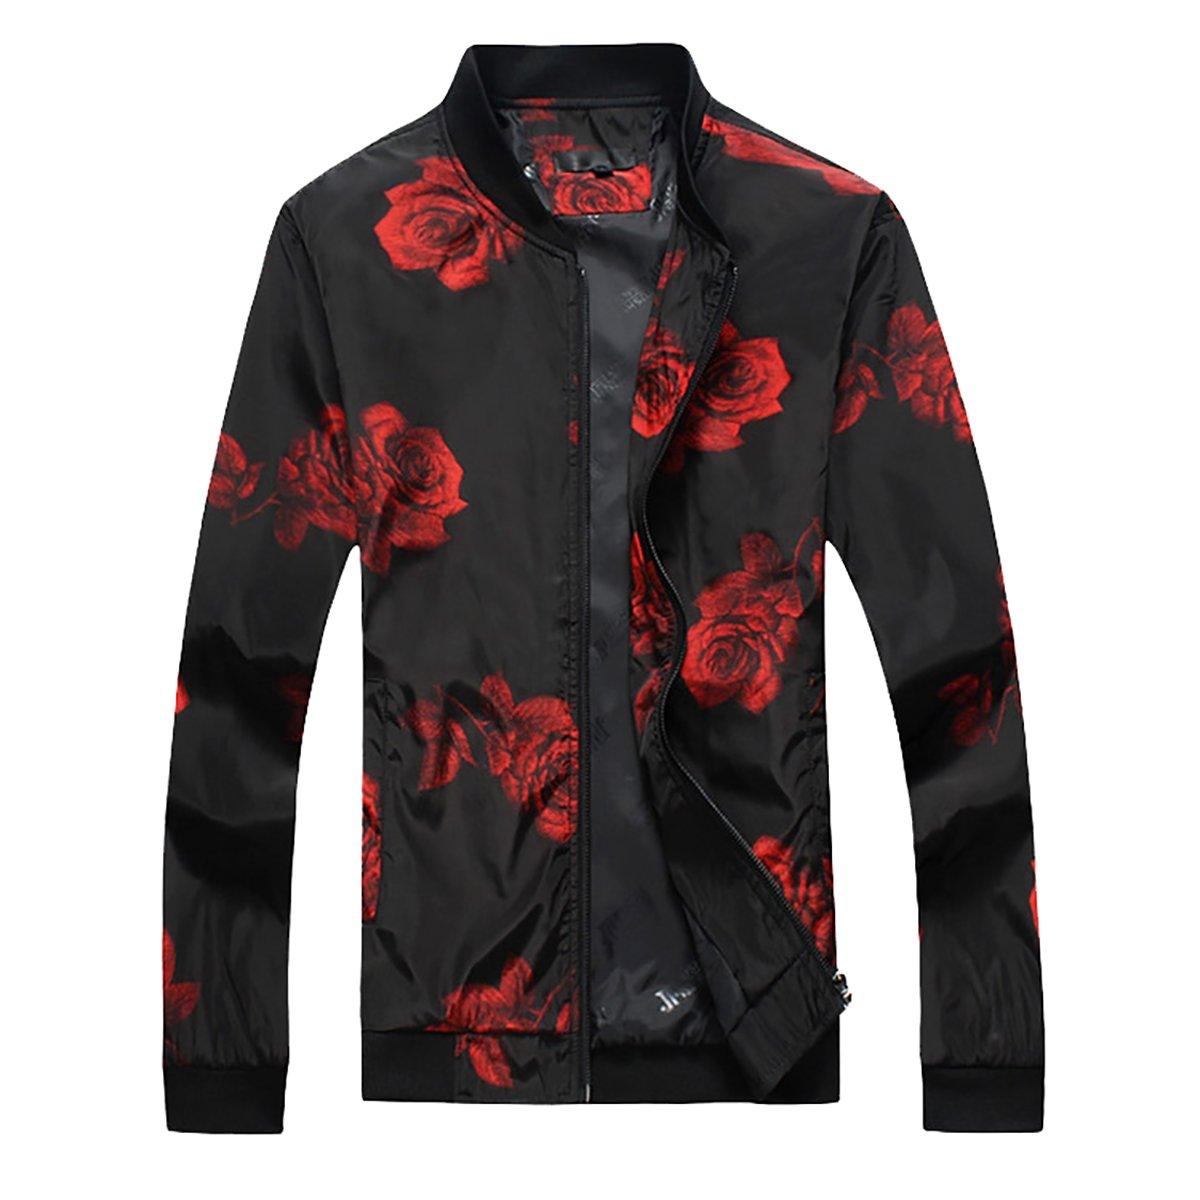 Cloudstyle Mens Slim Fit Jacket Lightweight Sportswear Casual Long Sleeve Bomber Jacket 003Jacket